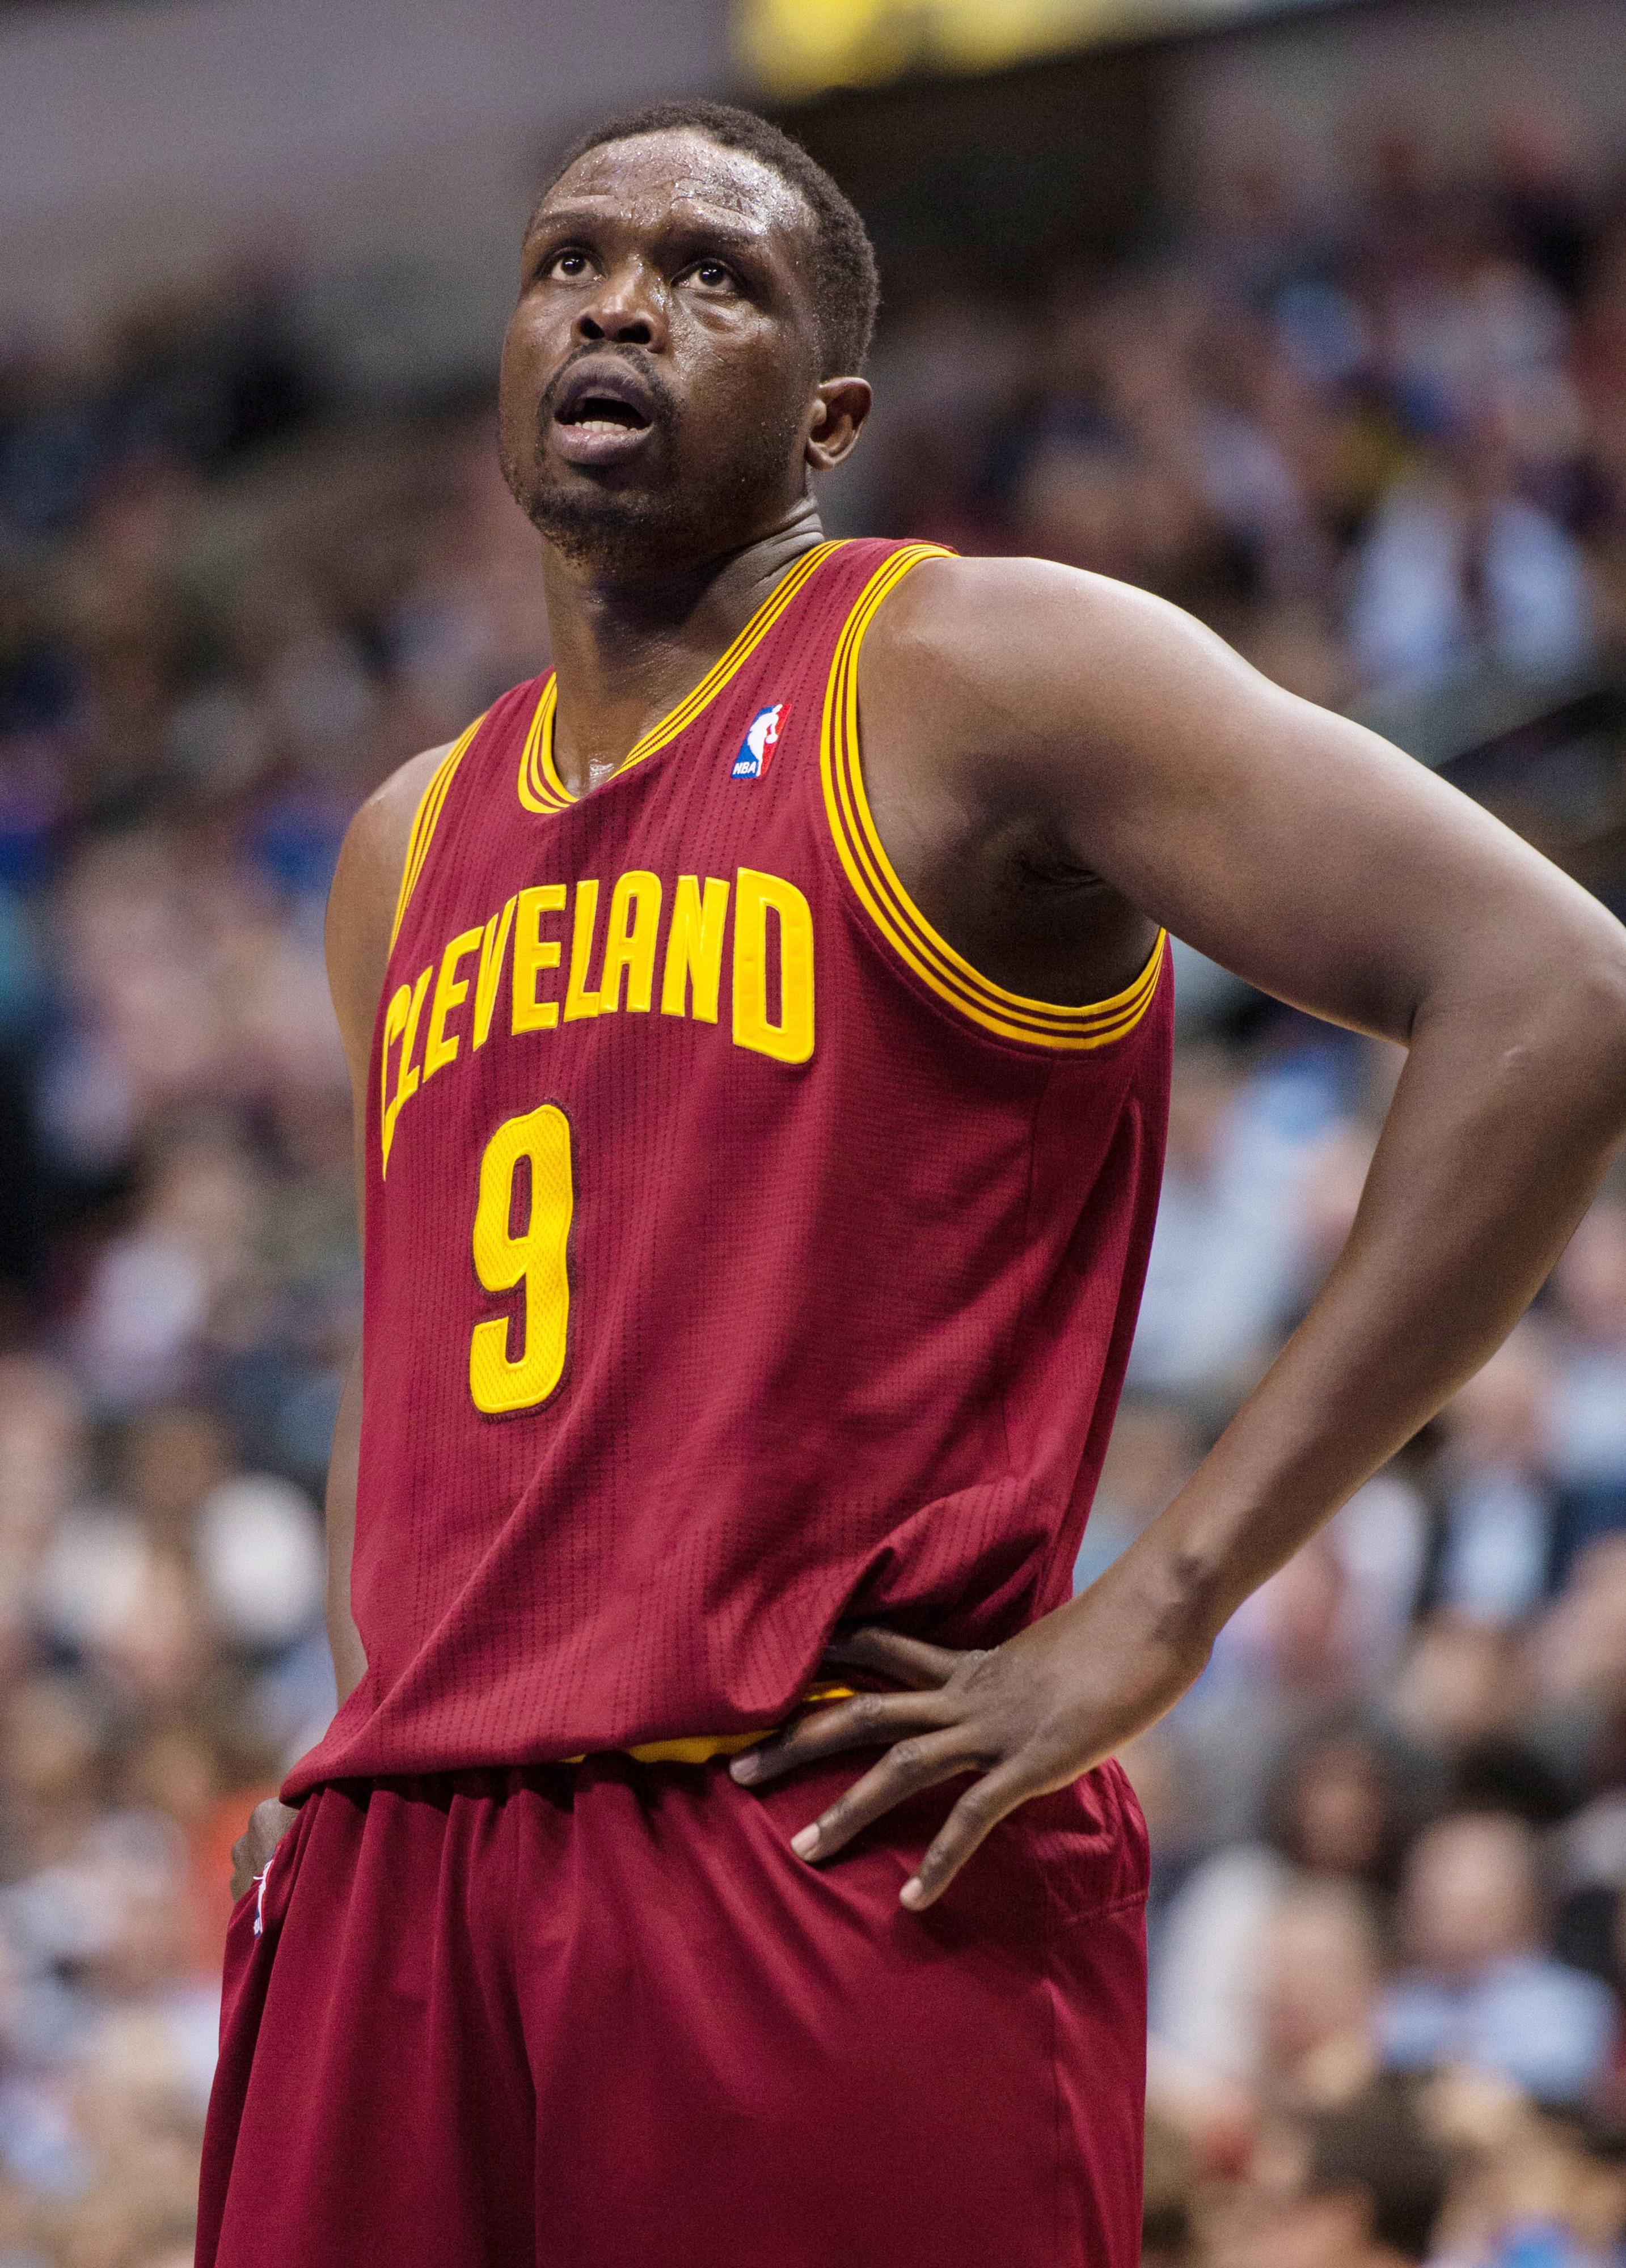 NBA trade rumors: Cavaliers testing trade market for Luol Deng, per report